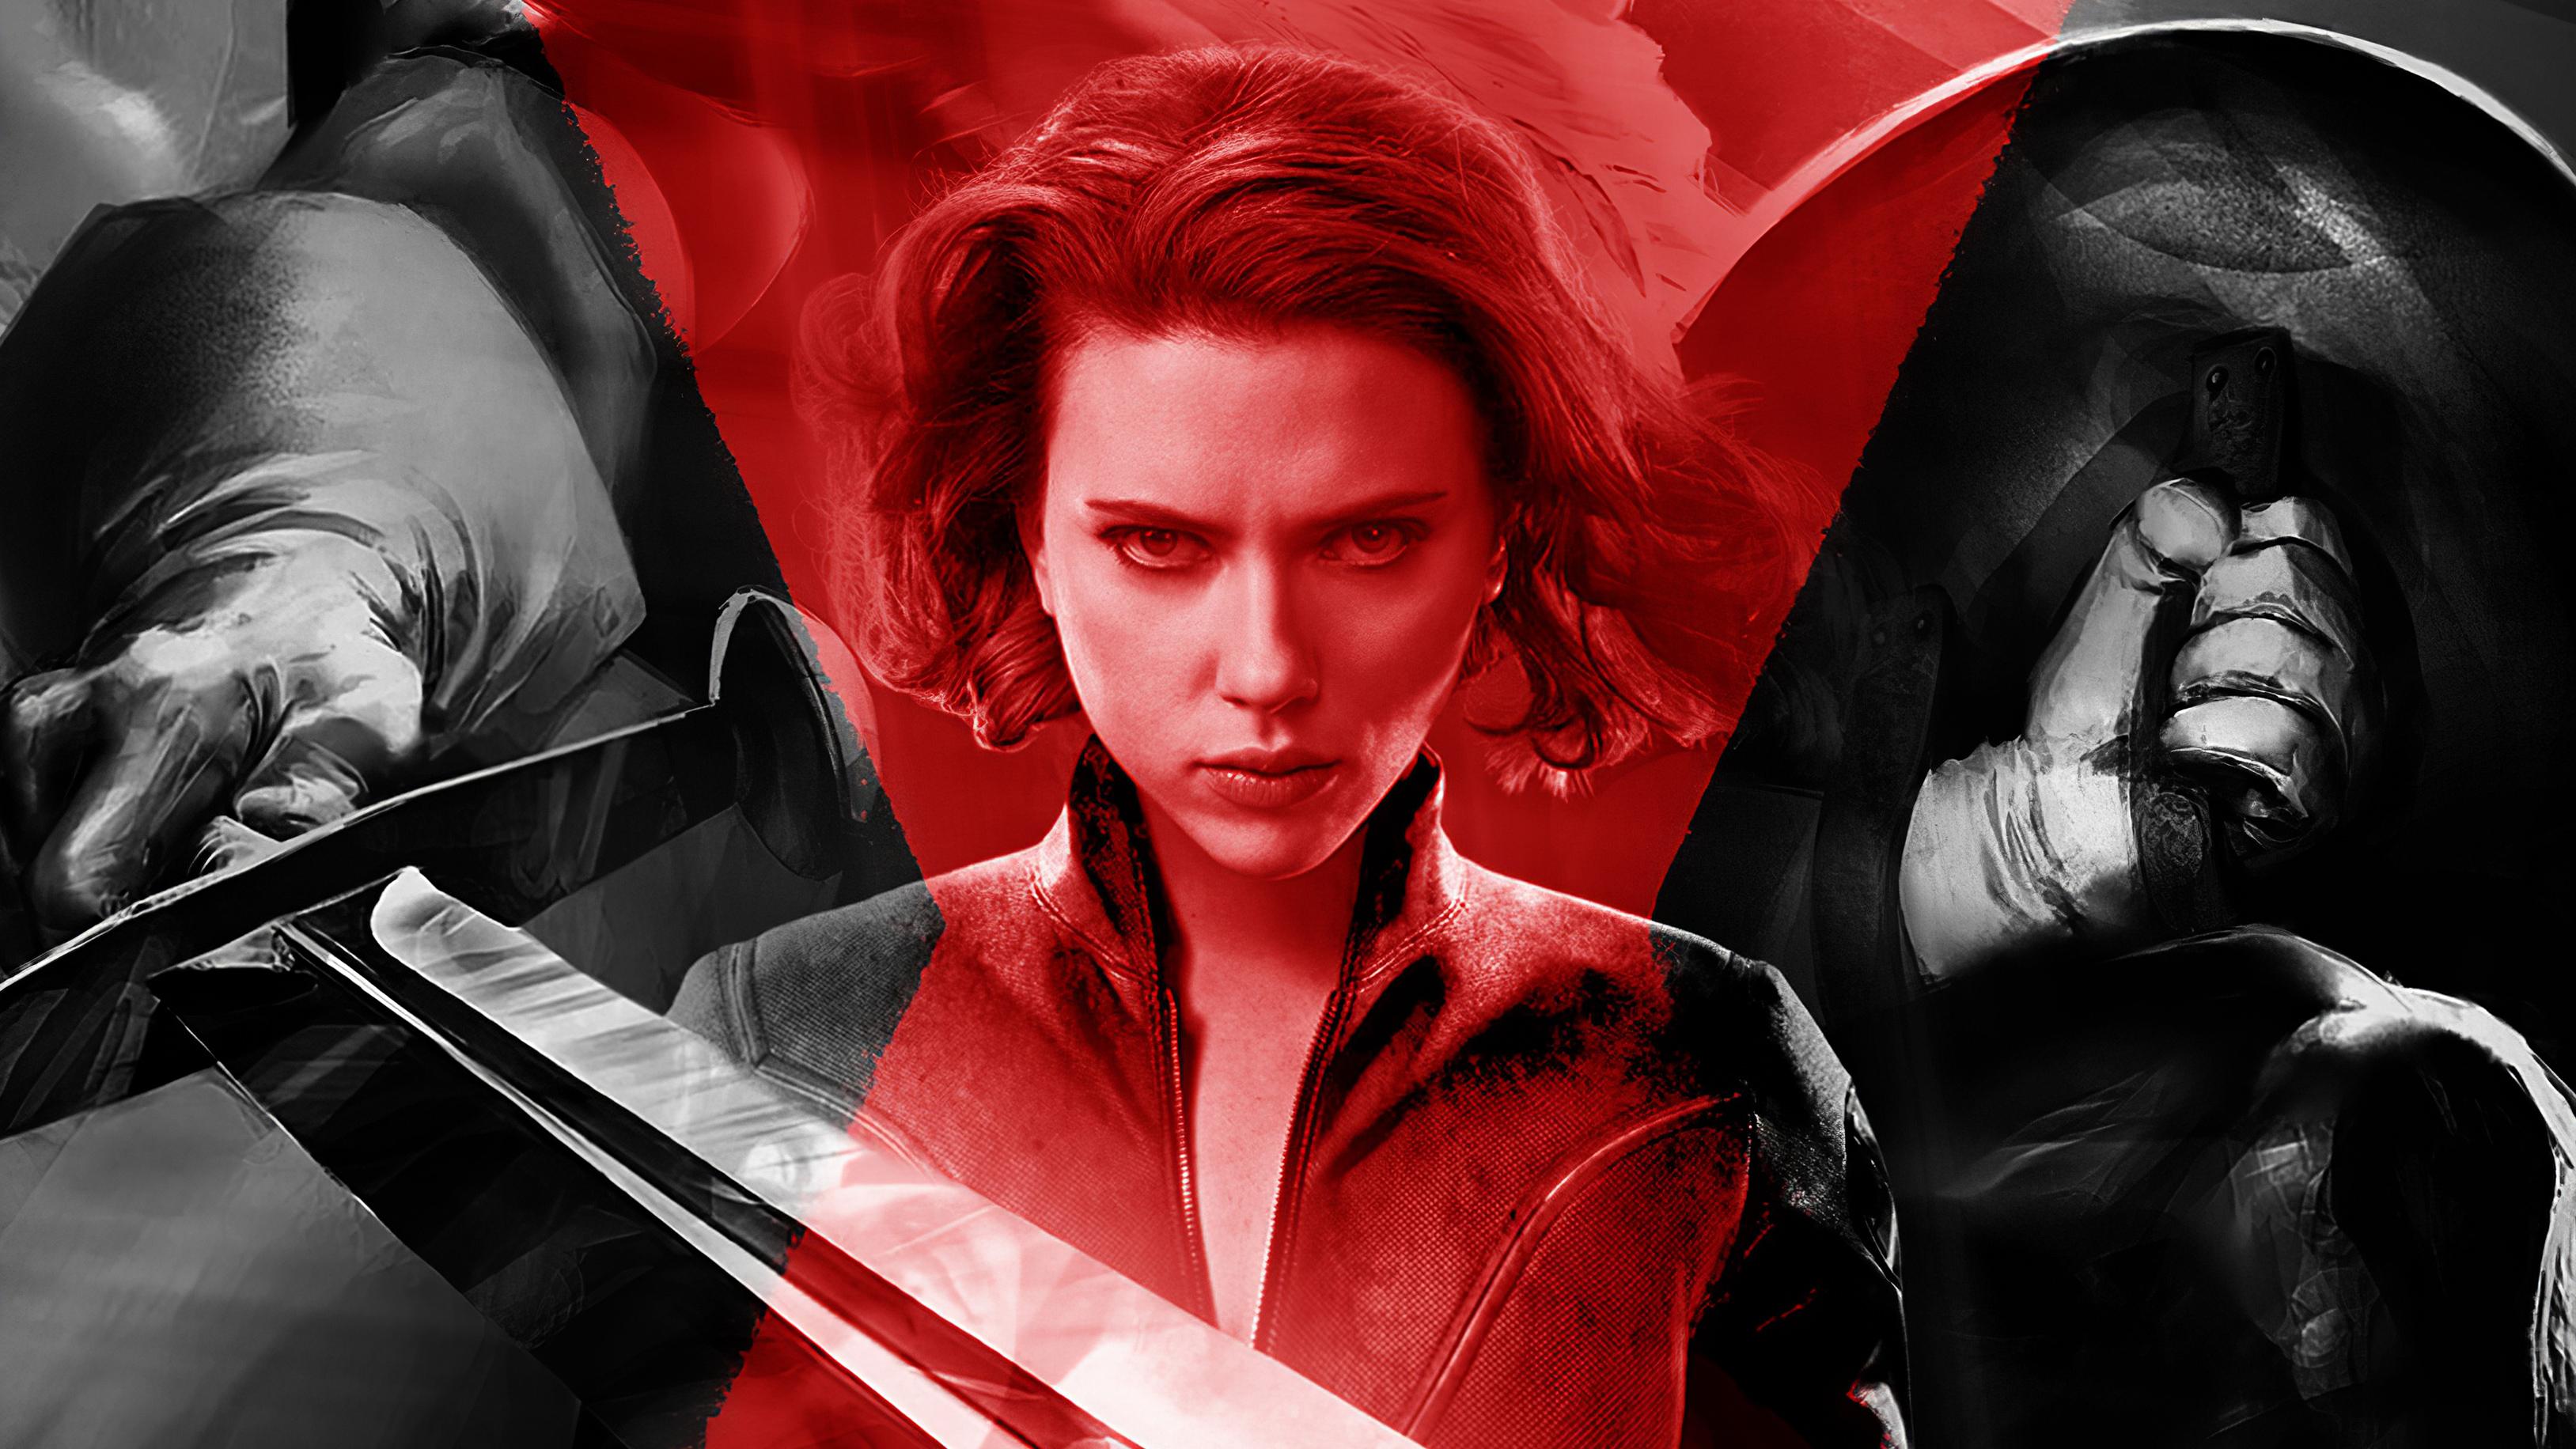 Black Widow Movie 2020 4k Hd Movies 4k Wallpapers Images